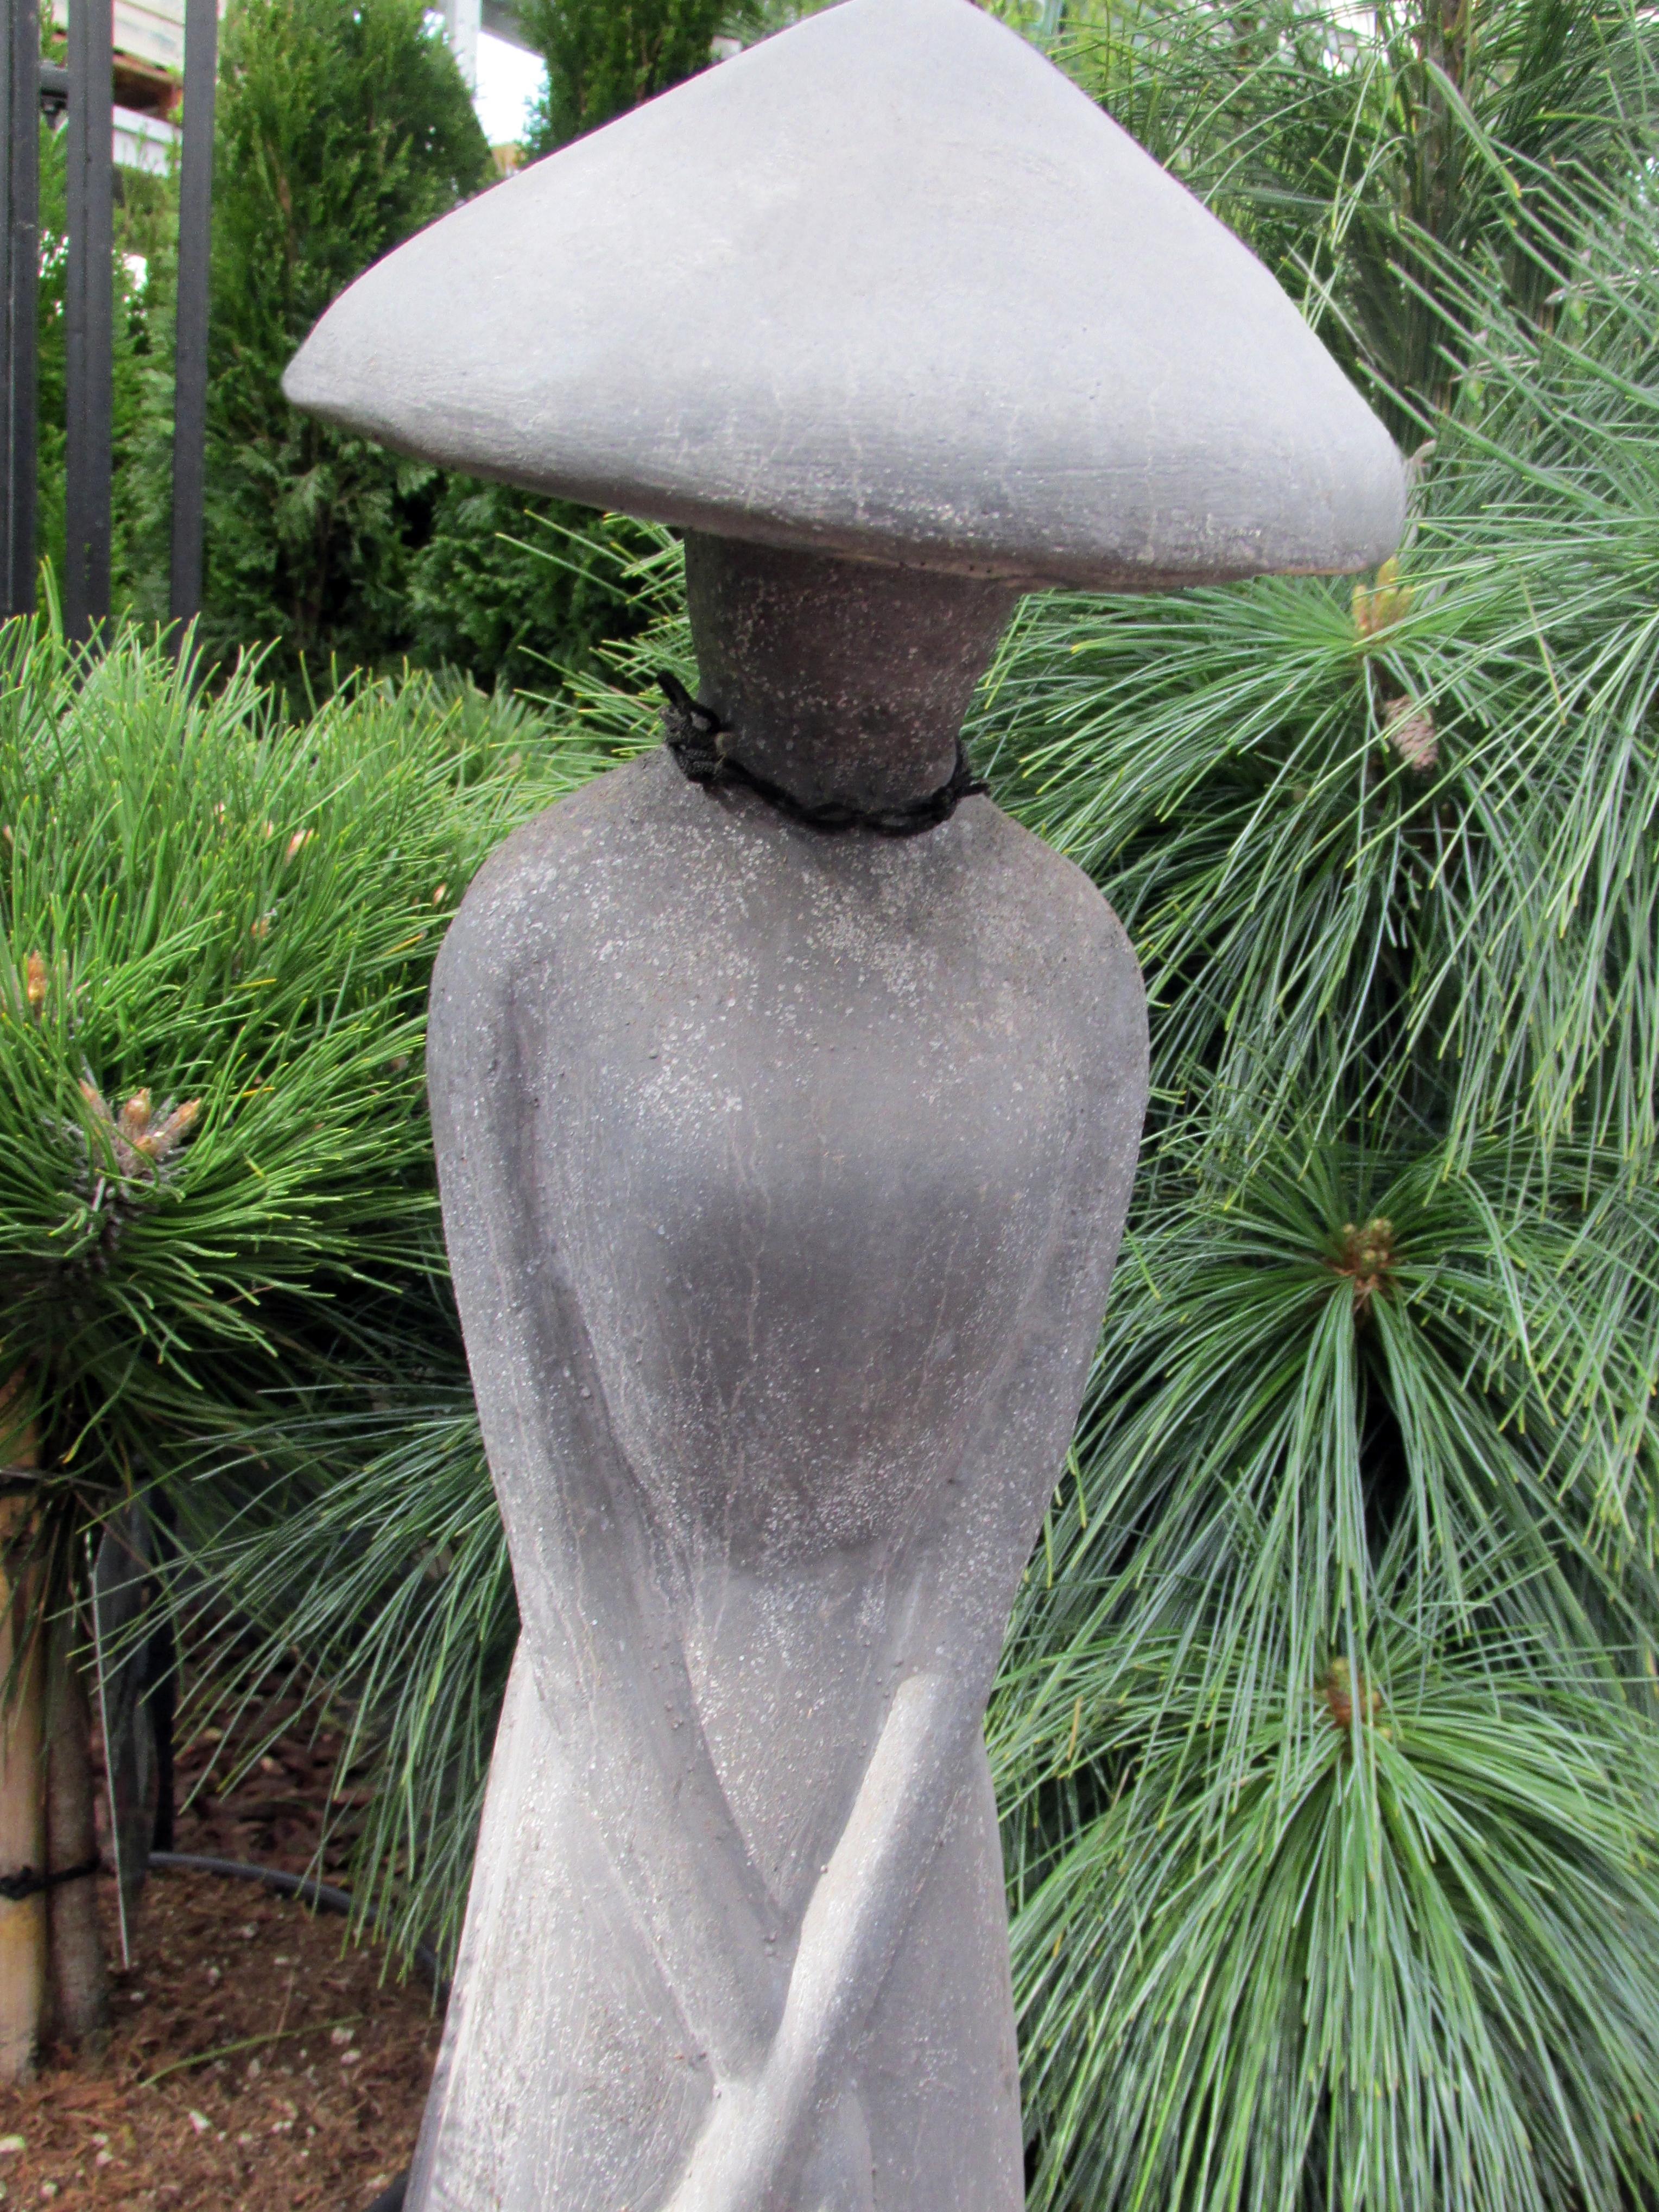 Filegarten Skulptur Panoramio 2jpg Wikimedia Commons